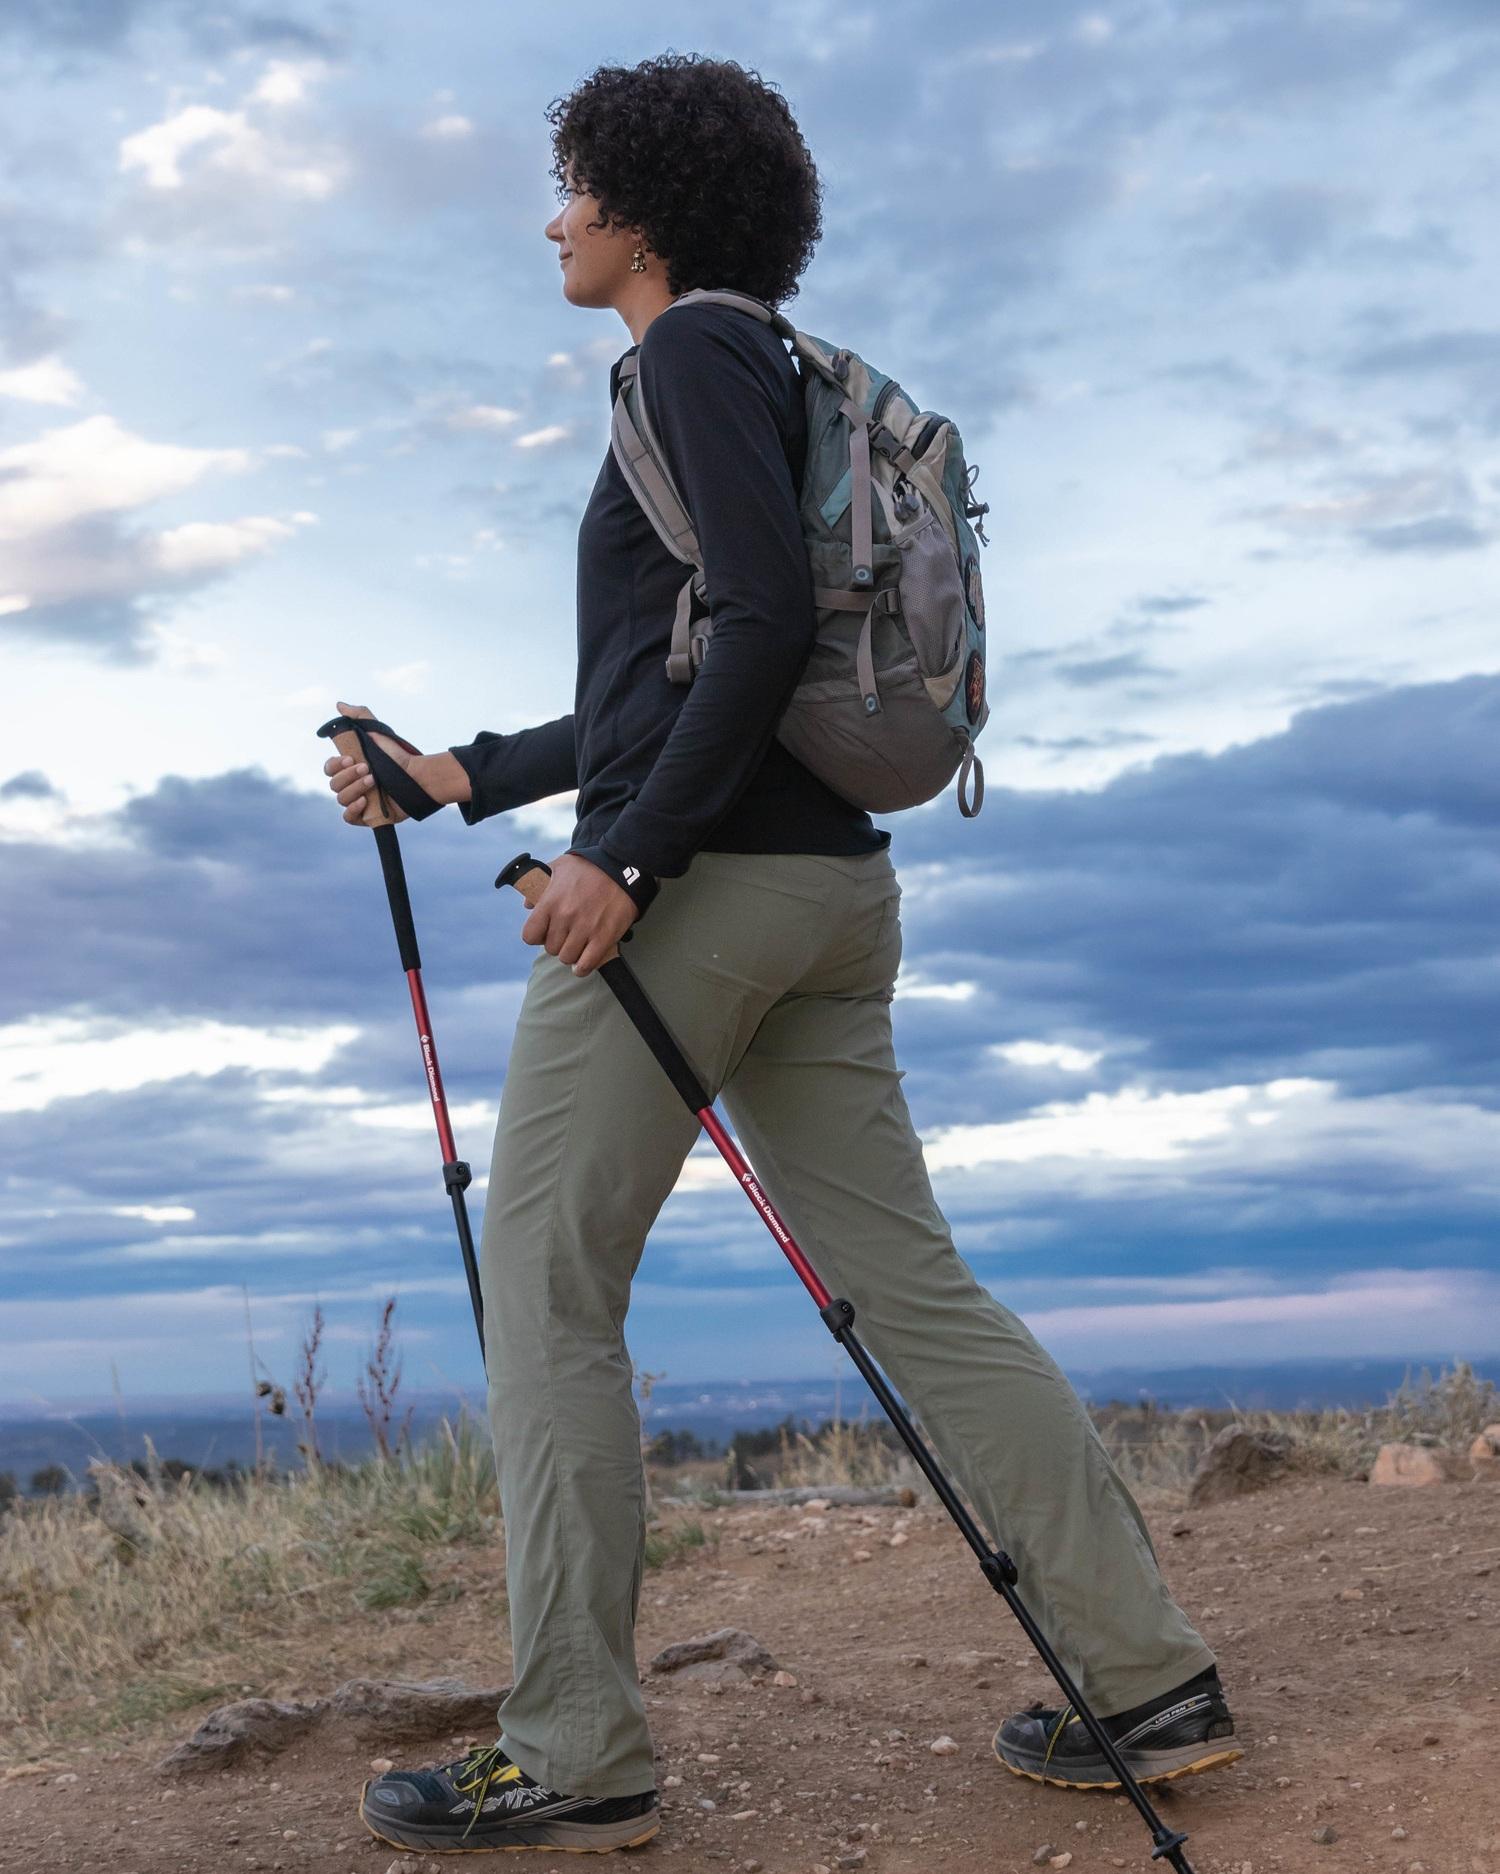 Writer Amanda Jameson using the Black Diamond Trail Ergo Cork hiking poles .  Photo by John Carr.